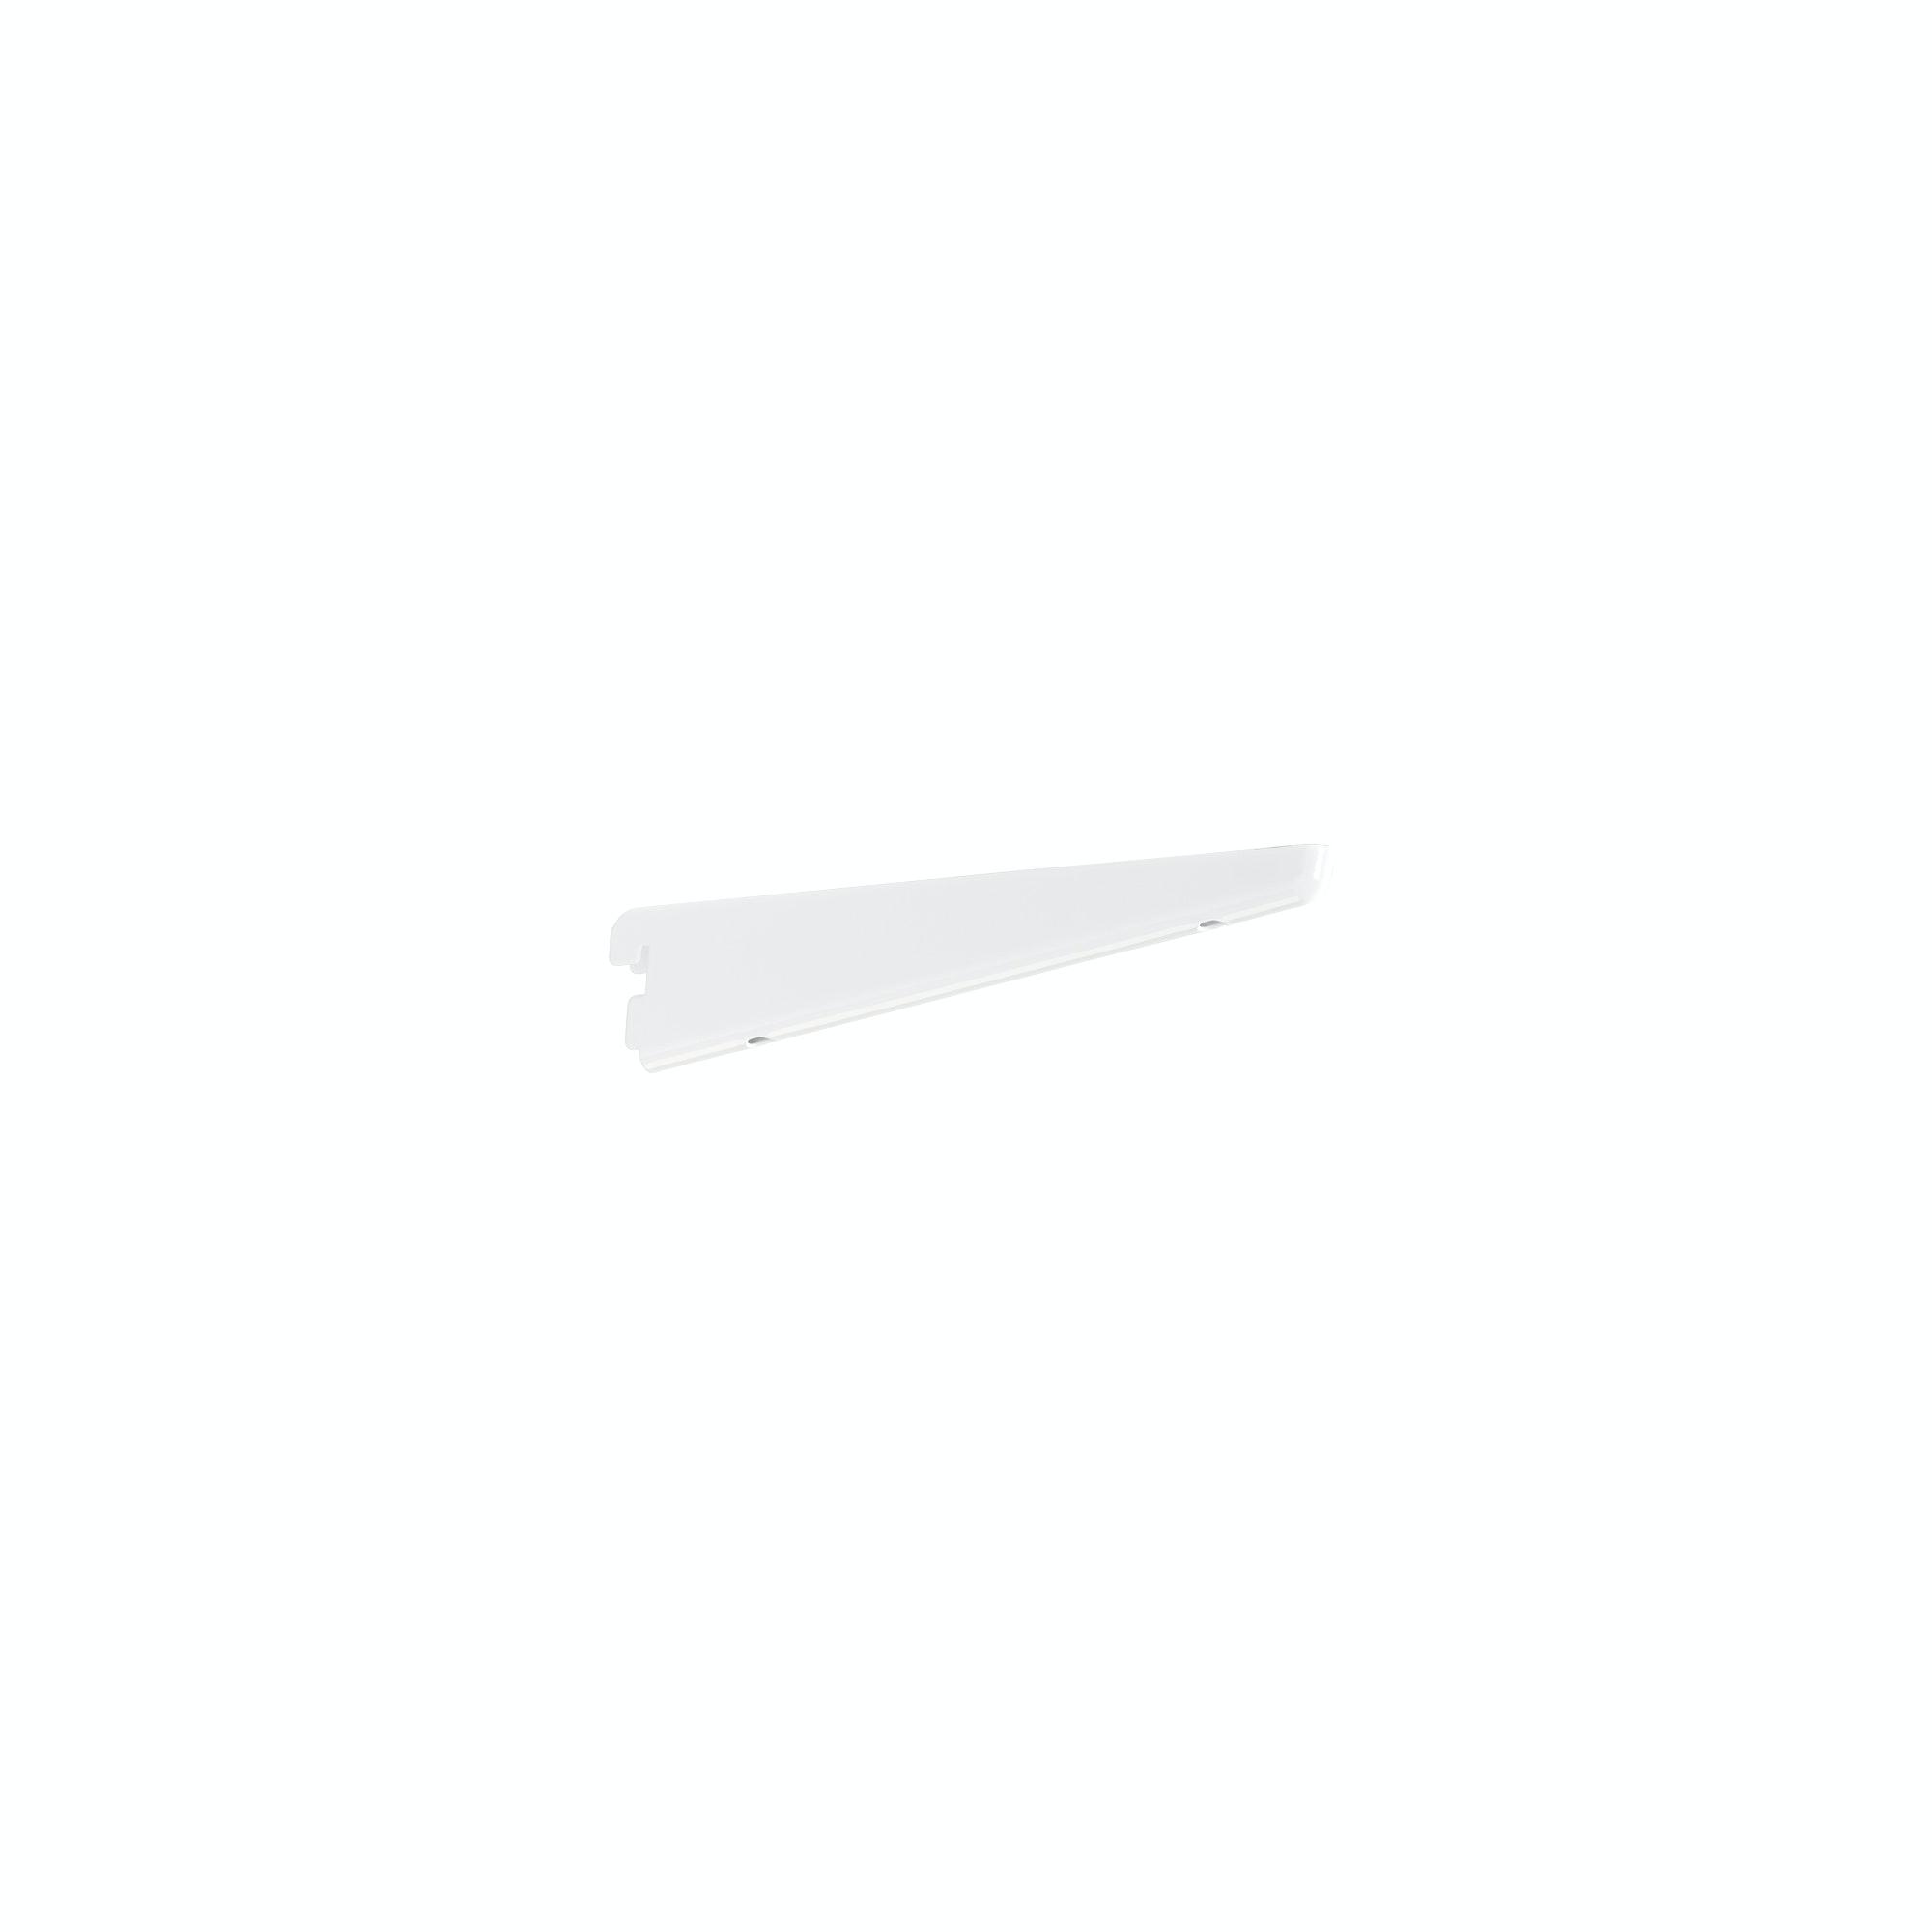 Sparringkonsol Elfa 220mm vit